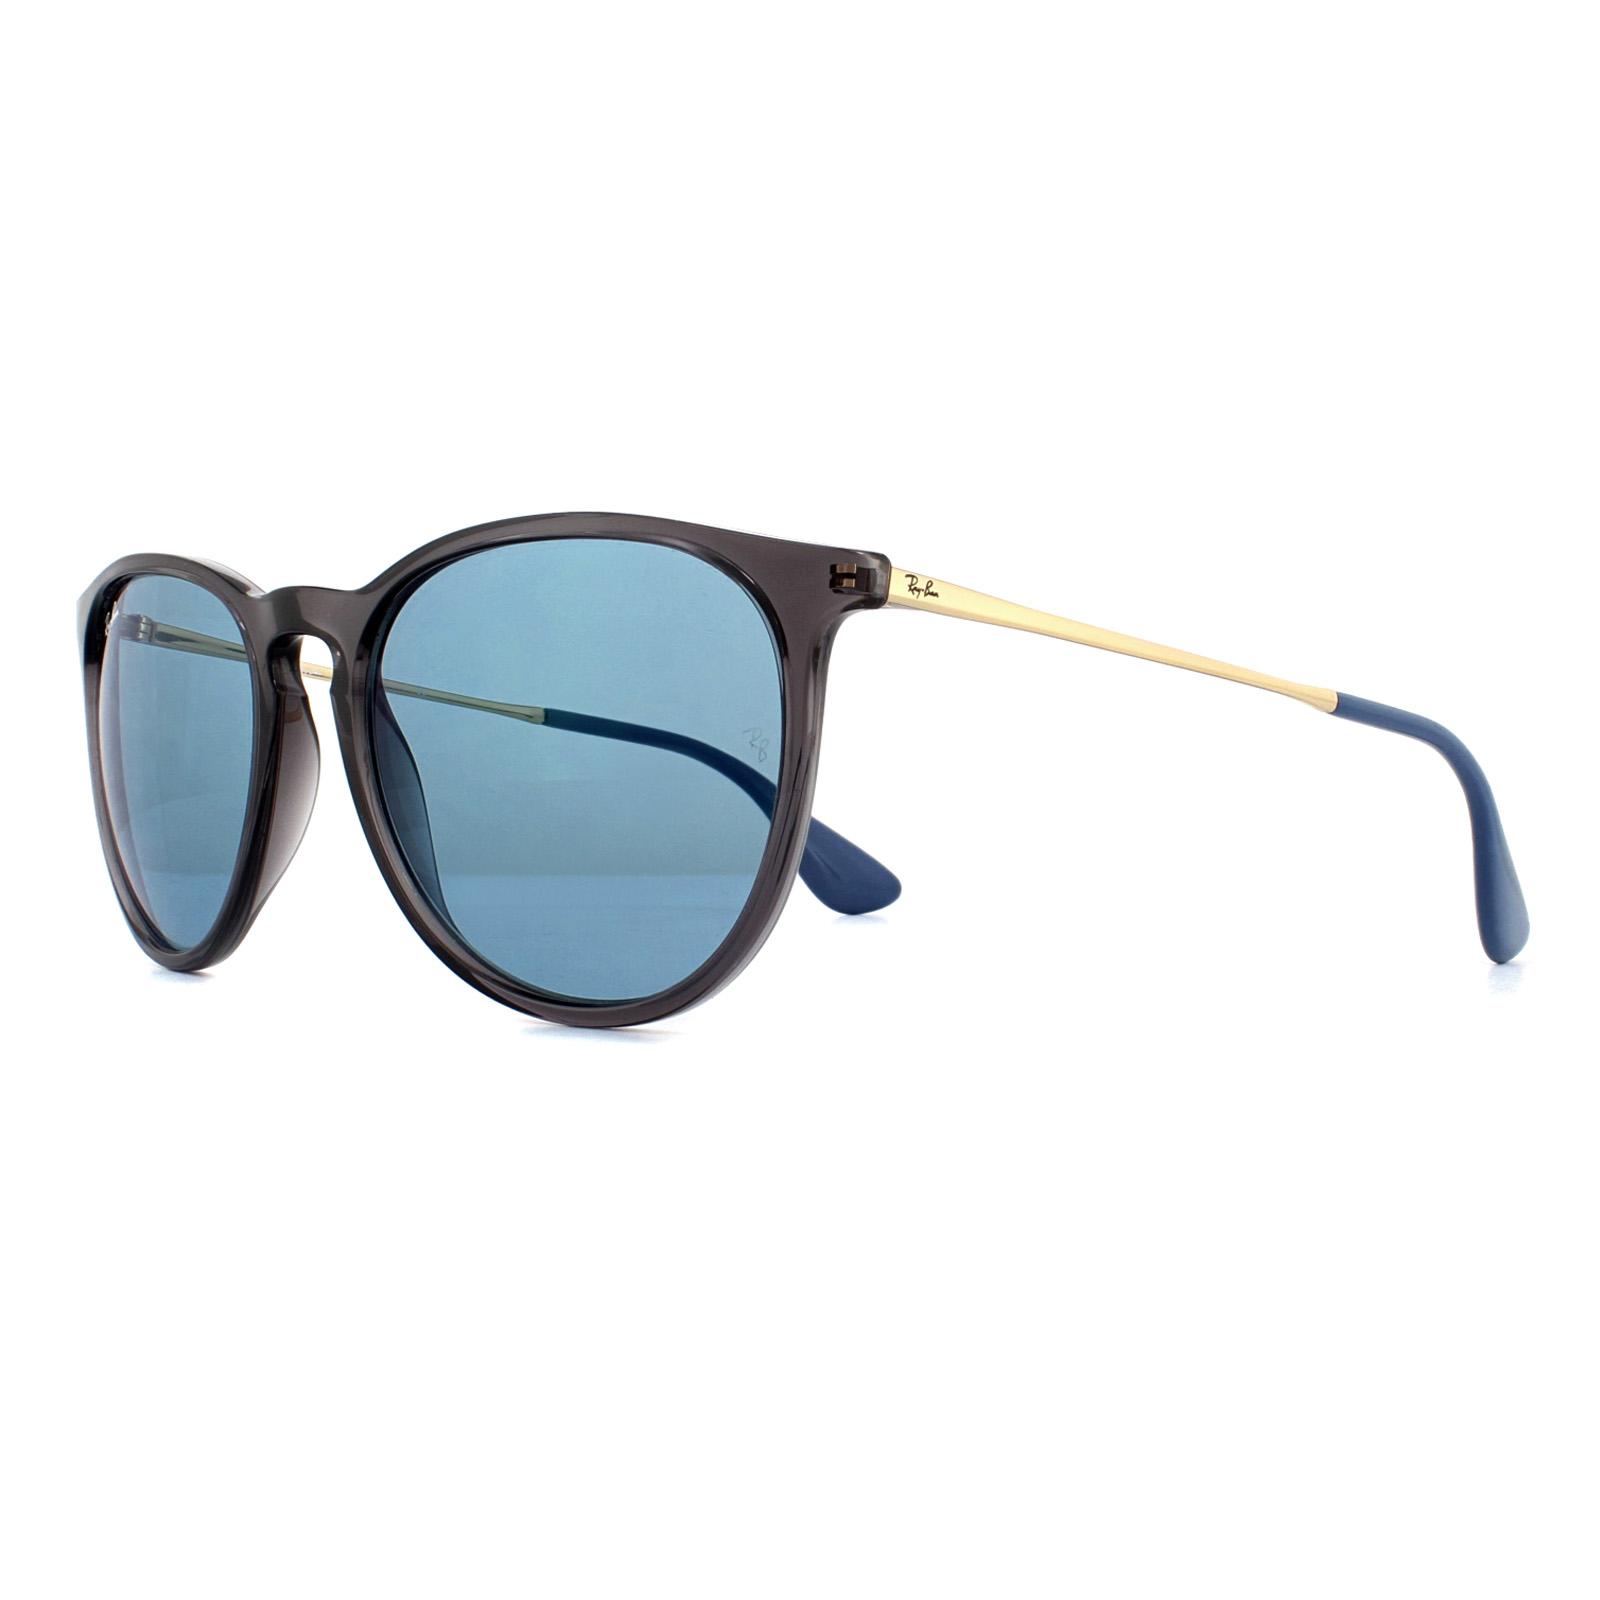 280eac96a3d Sentinel Ray-Ban Sunglasses Erika 4171 6340F7 Transparent Grey Light Blue